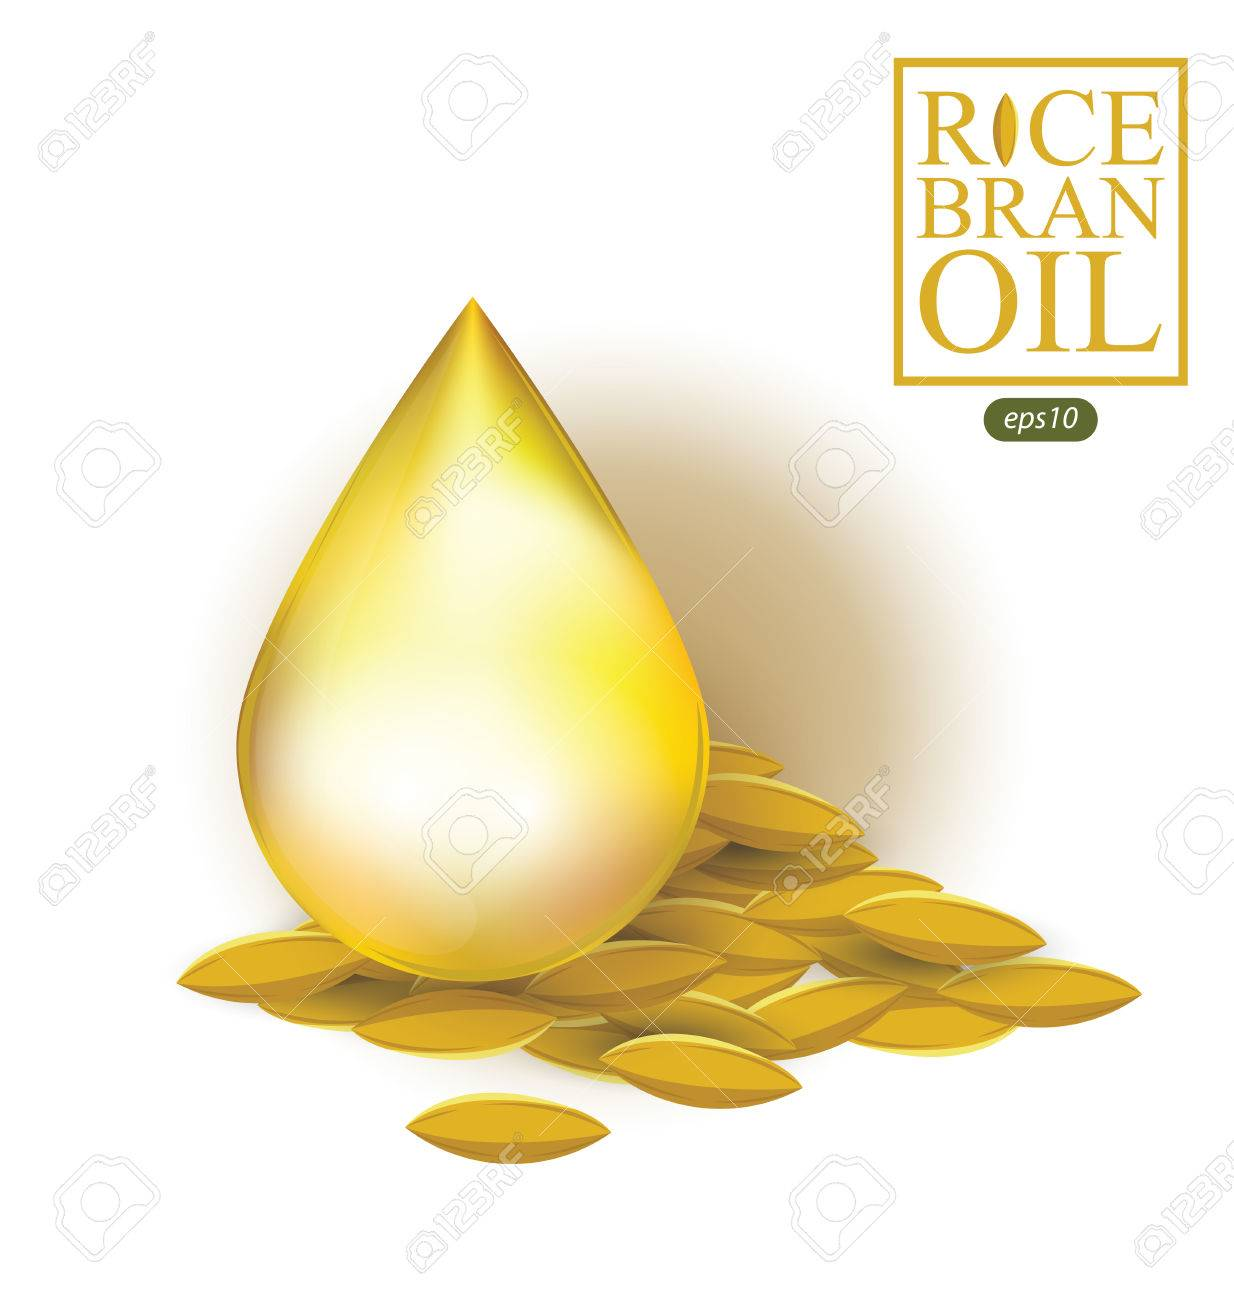 Rice bran oil. Vector illustration..